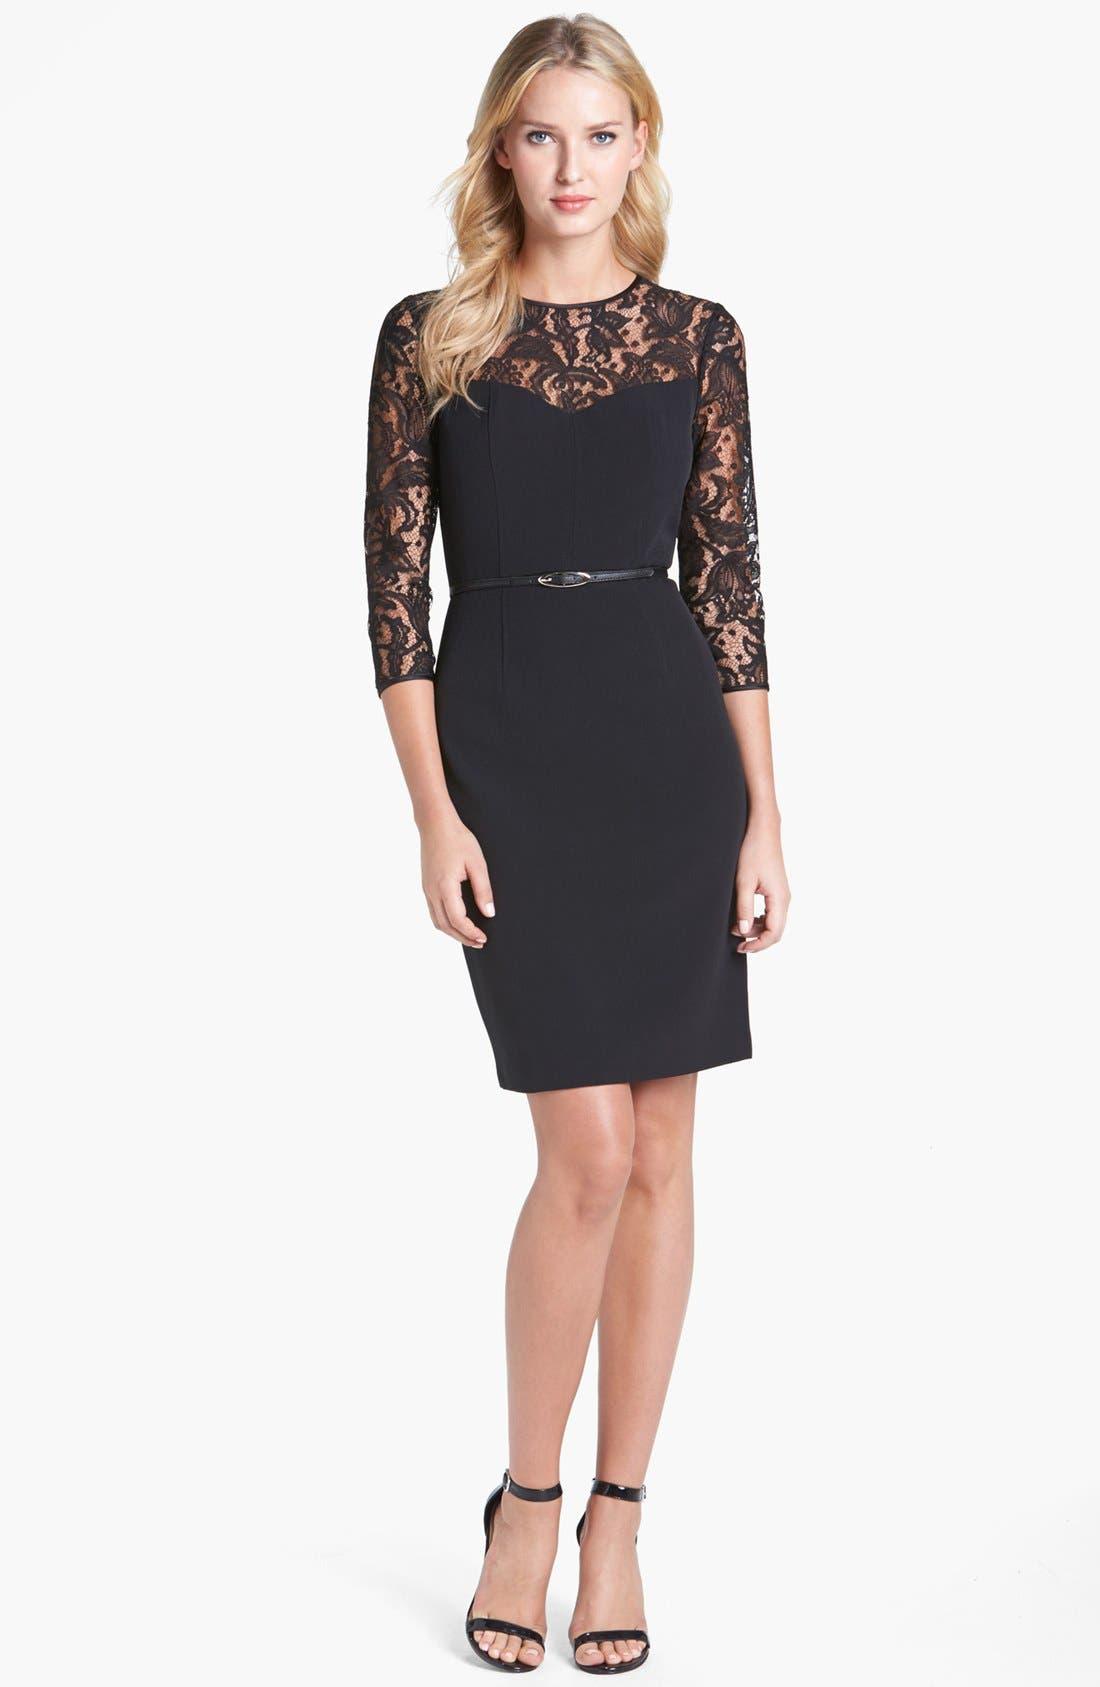 Alternate Image 1 Selected - Adrianna Papell Lace Yoke Crepe Sheath Dress